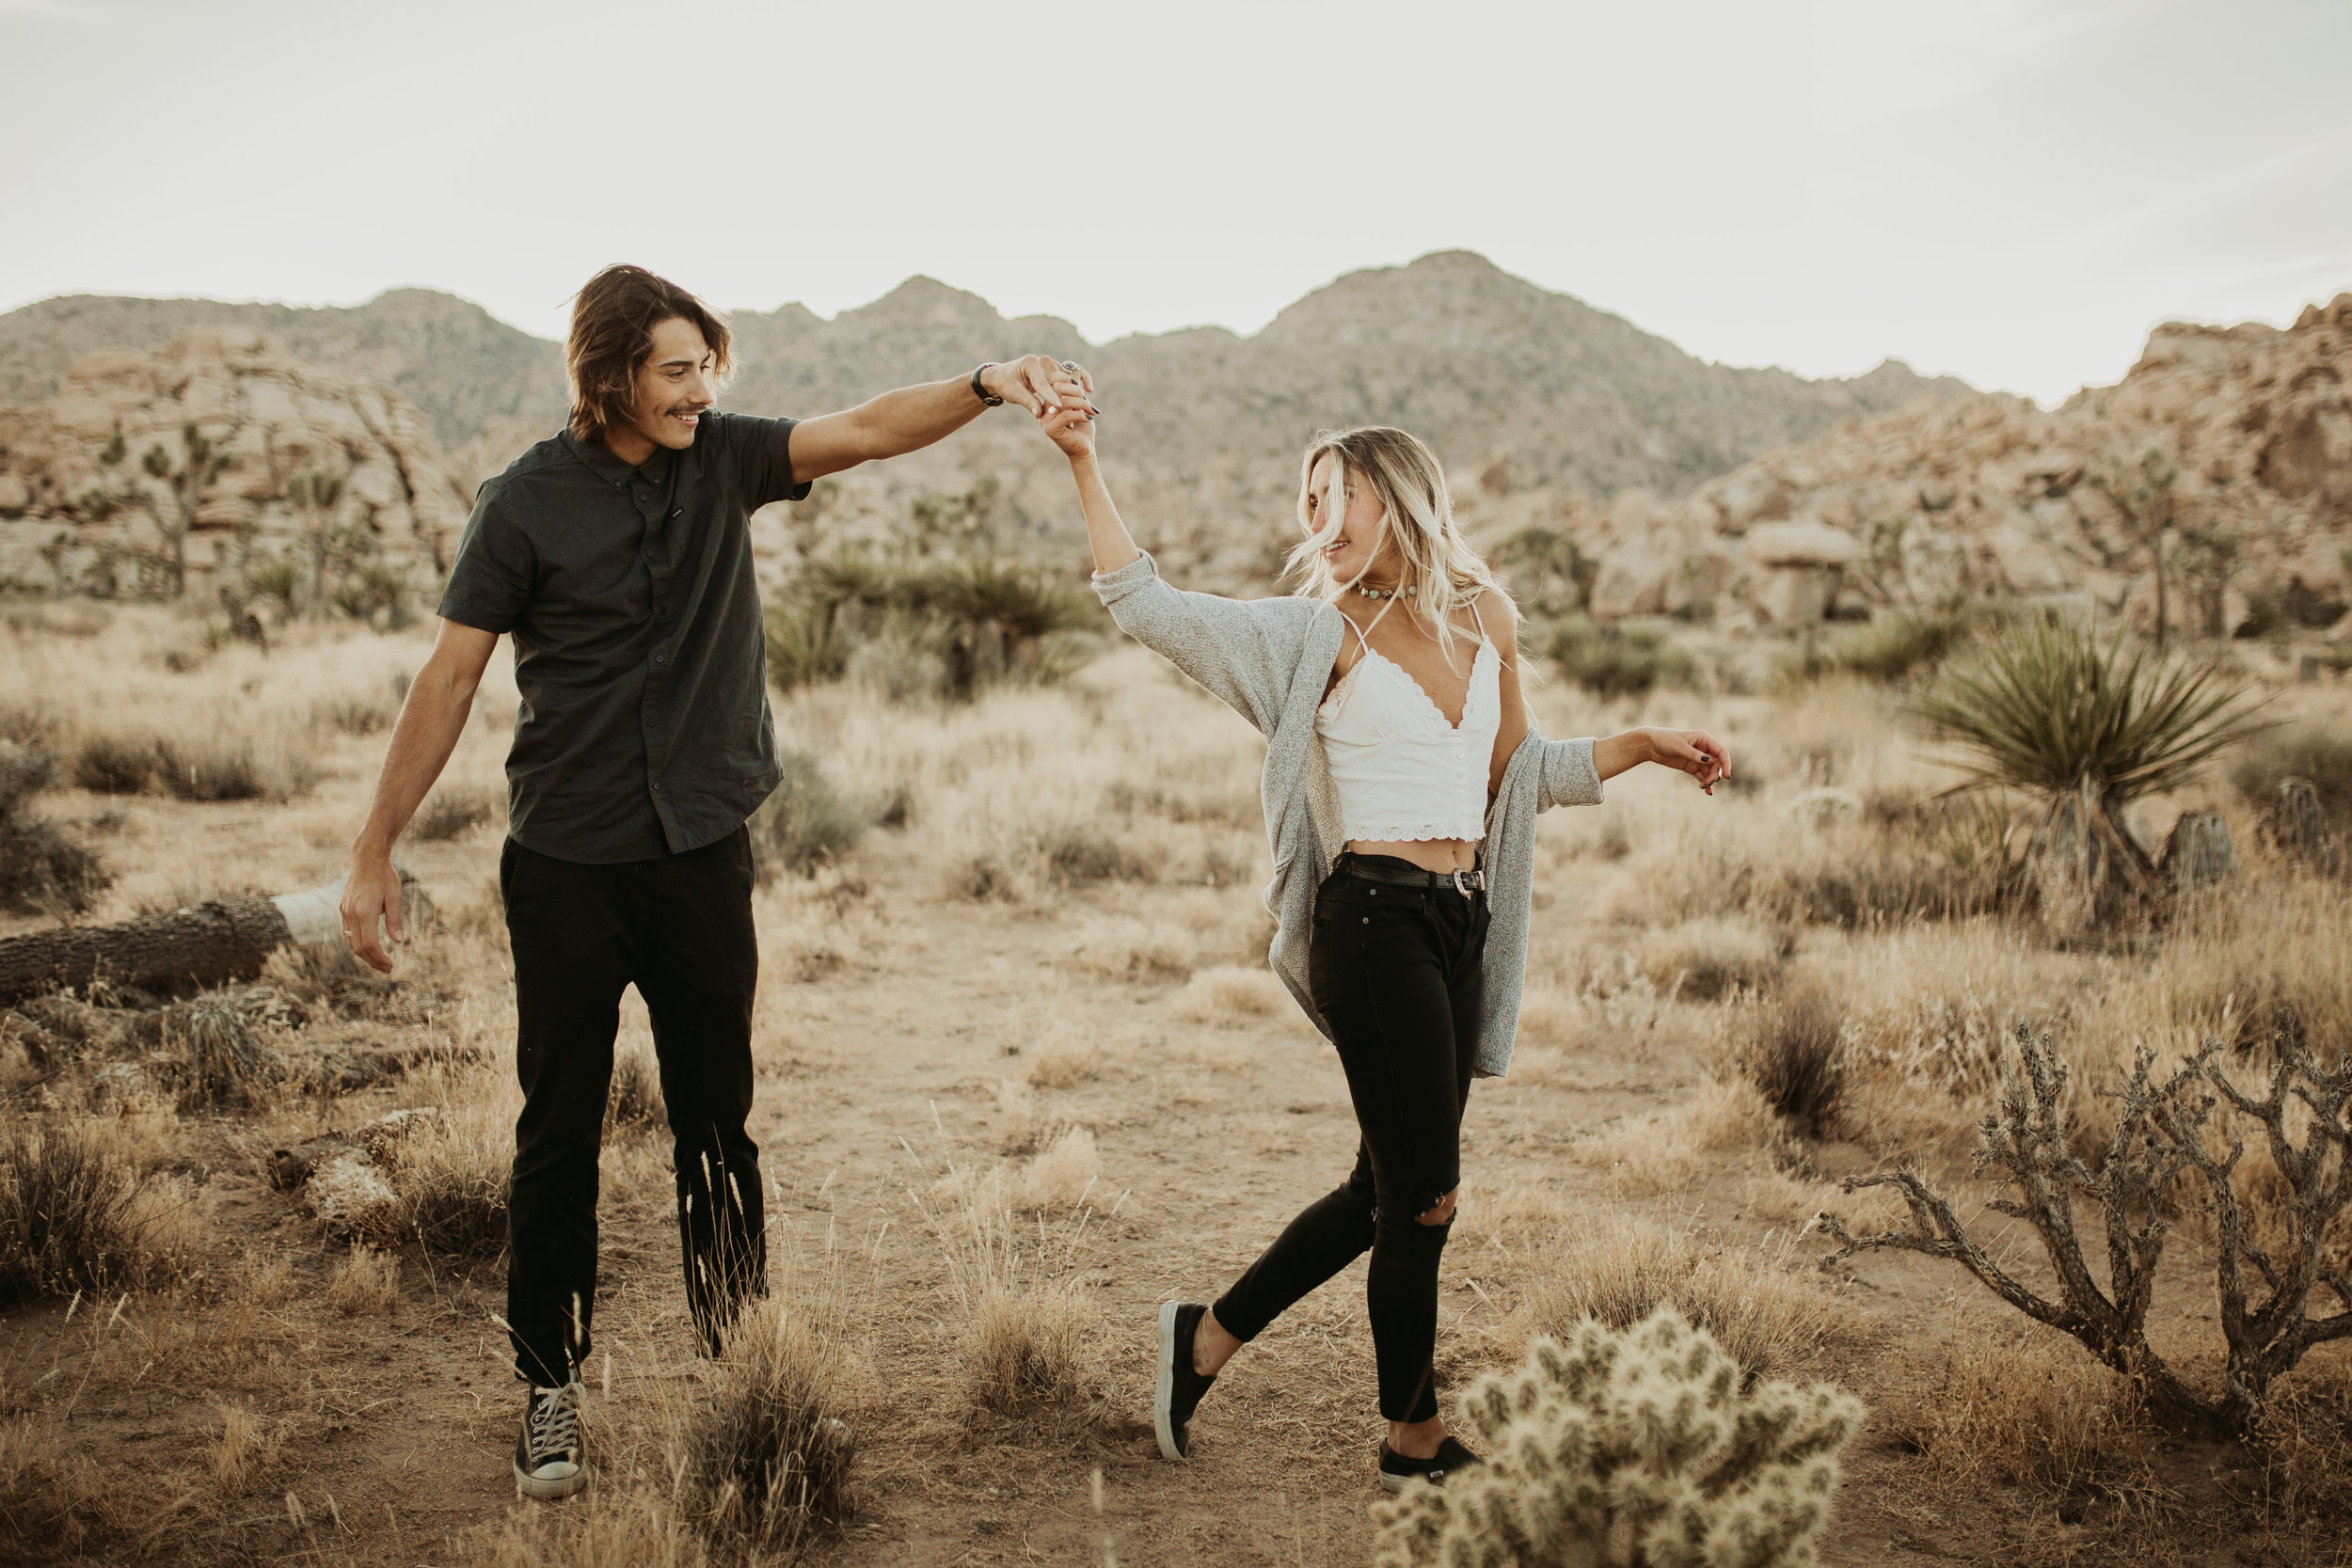 joshuatree+california+arizona+wedding+elopement+photographer19.jpg